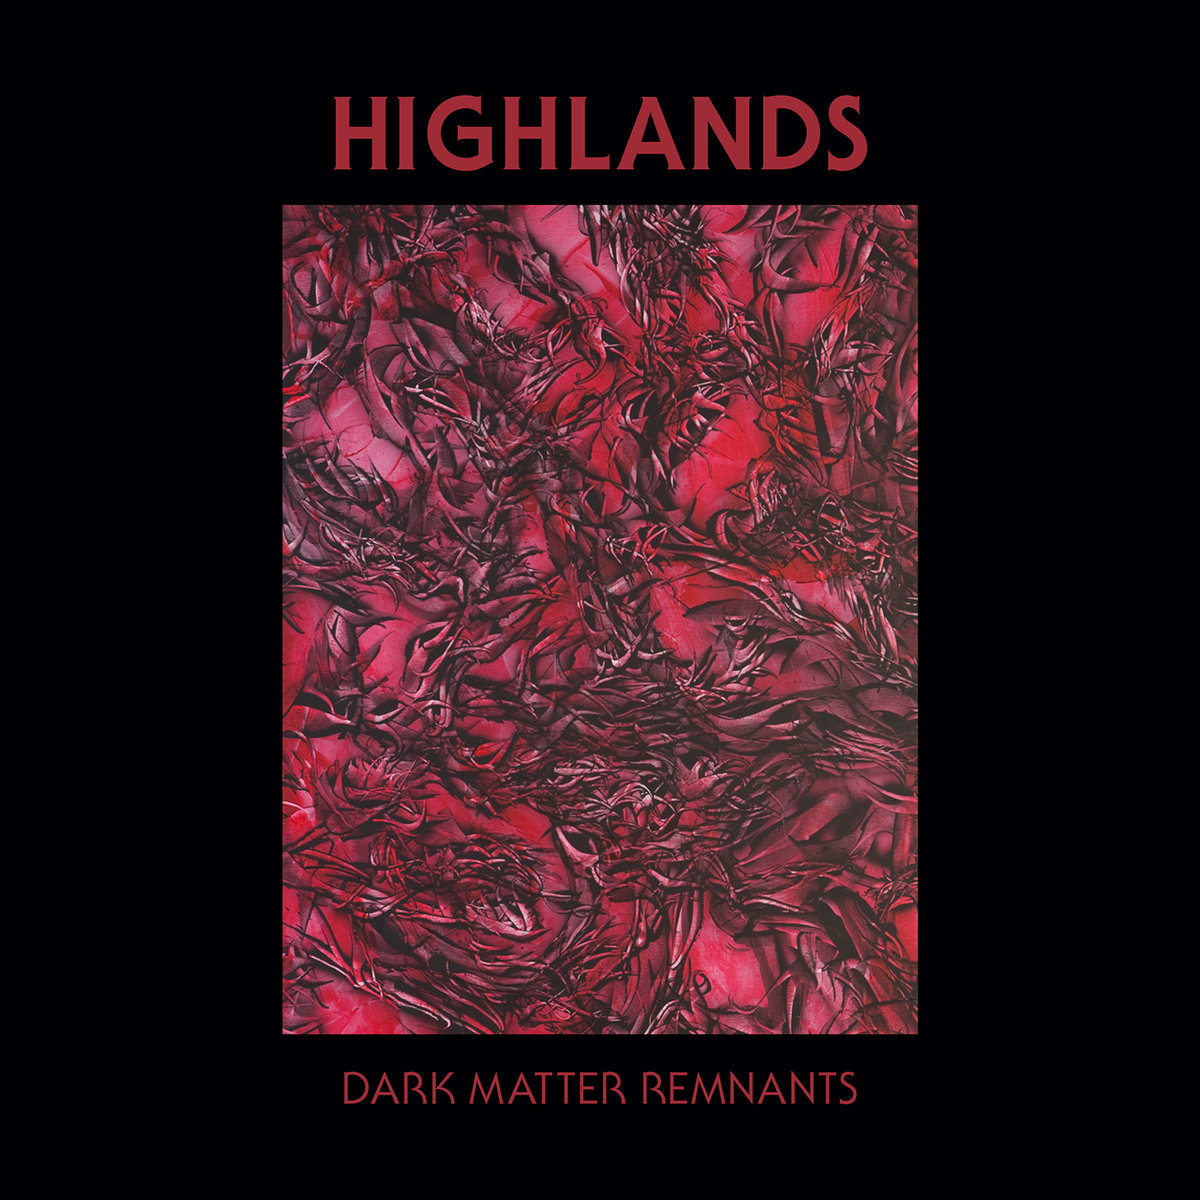 Highlands_DMR.jpg